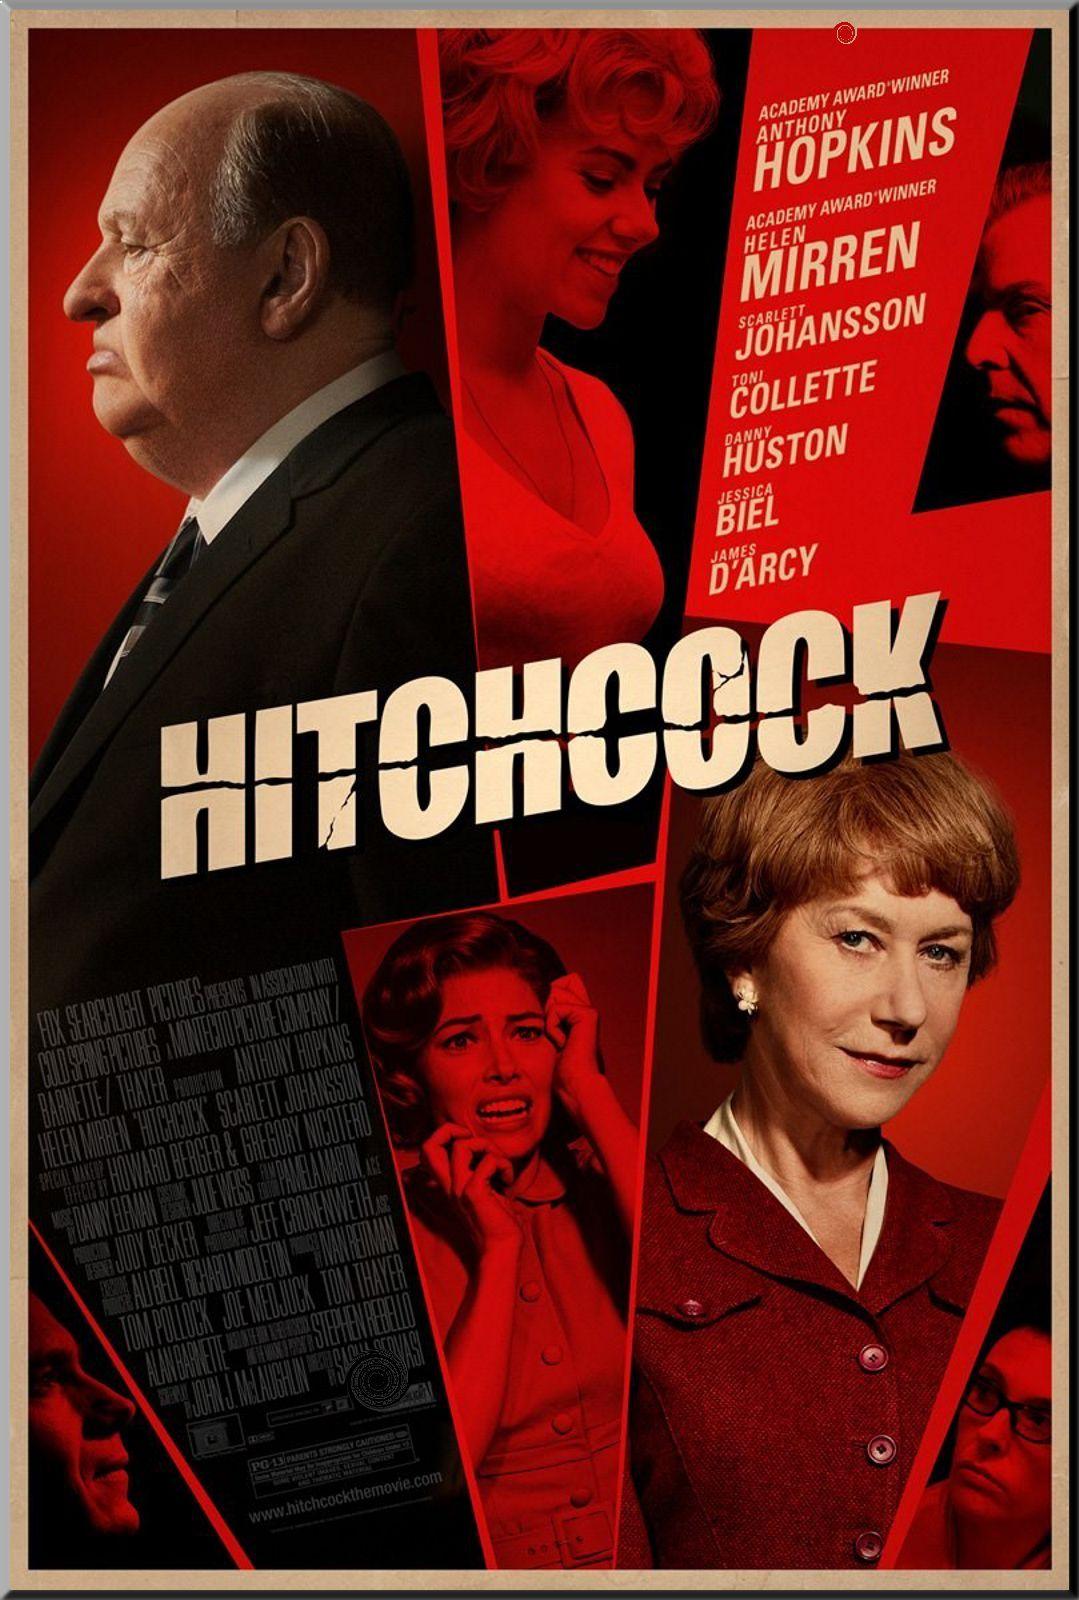 http://2.bp.blogspot.com/-Po17k06qx5I/UHb_qqzgzbI/AAAAAAAAk5Y/8aTfmdkTliU/s1600/Trailer-hischcok-05.jpg